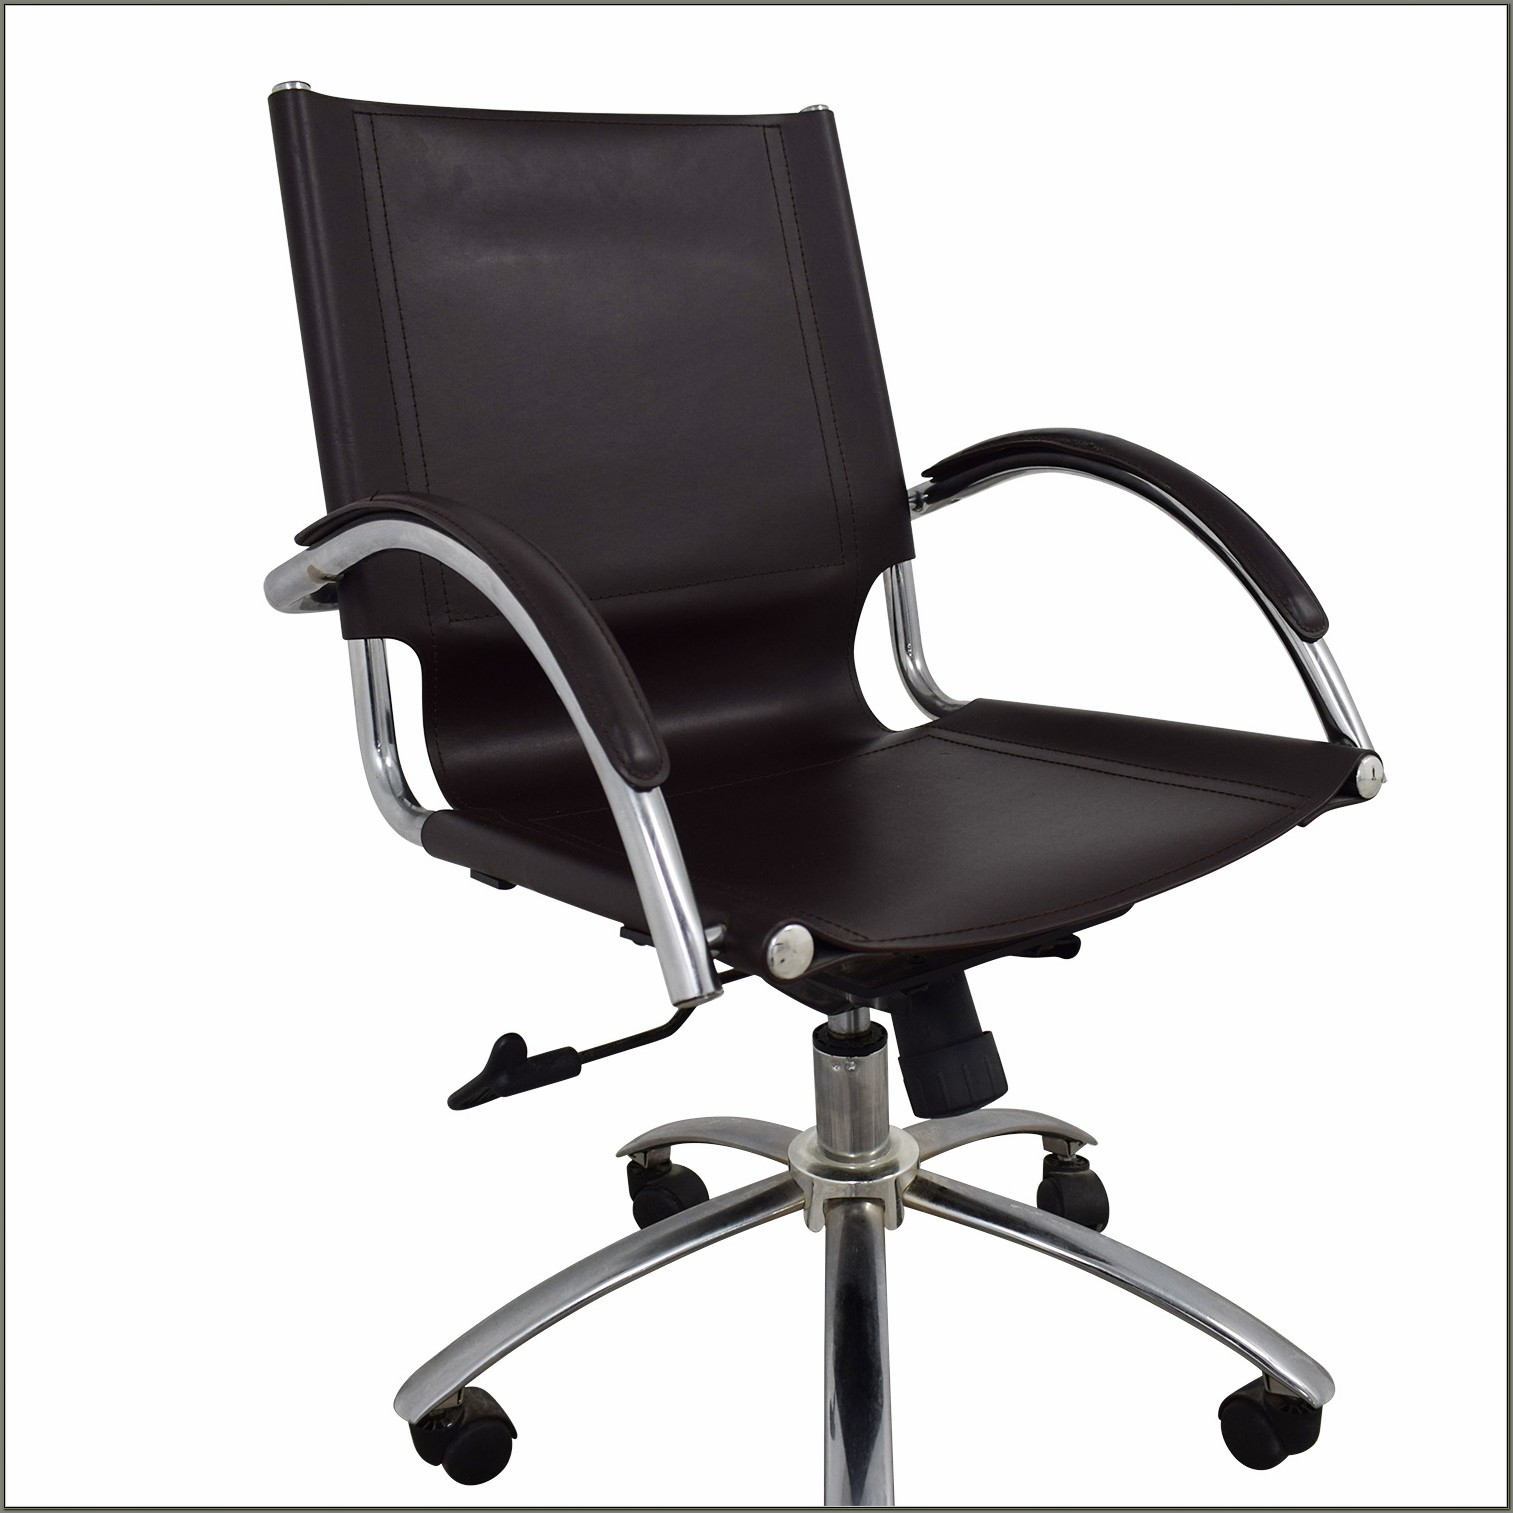 Swivel Leather Desk Chair West Elm